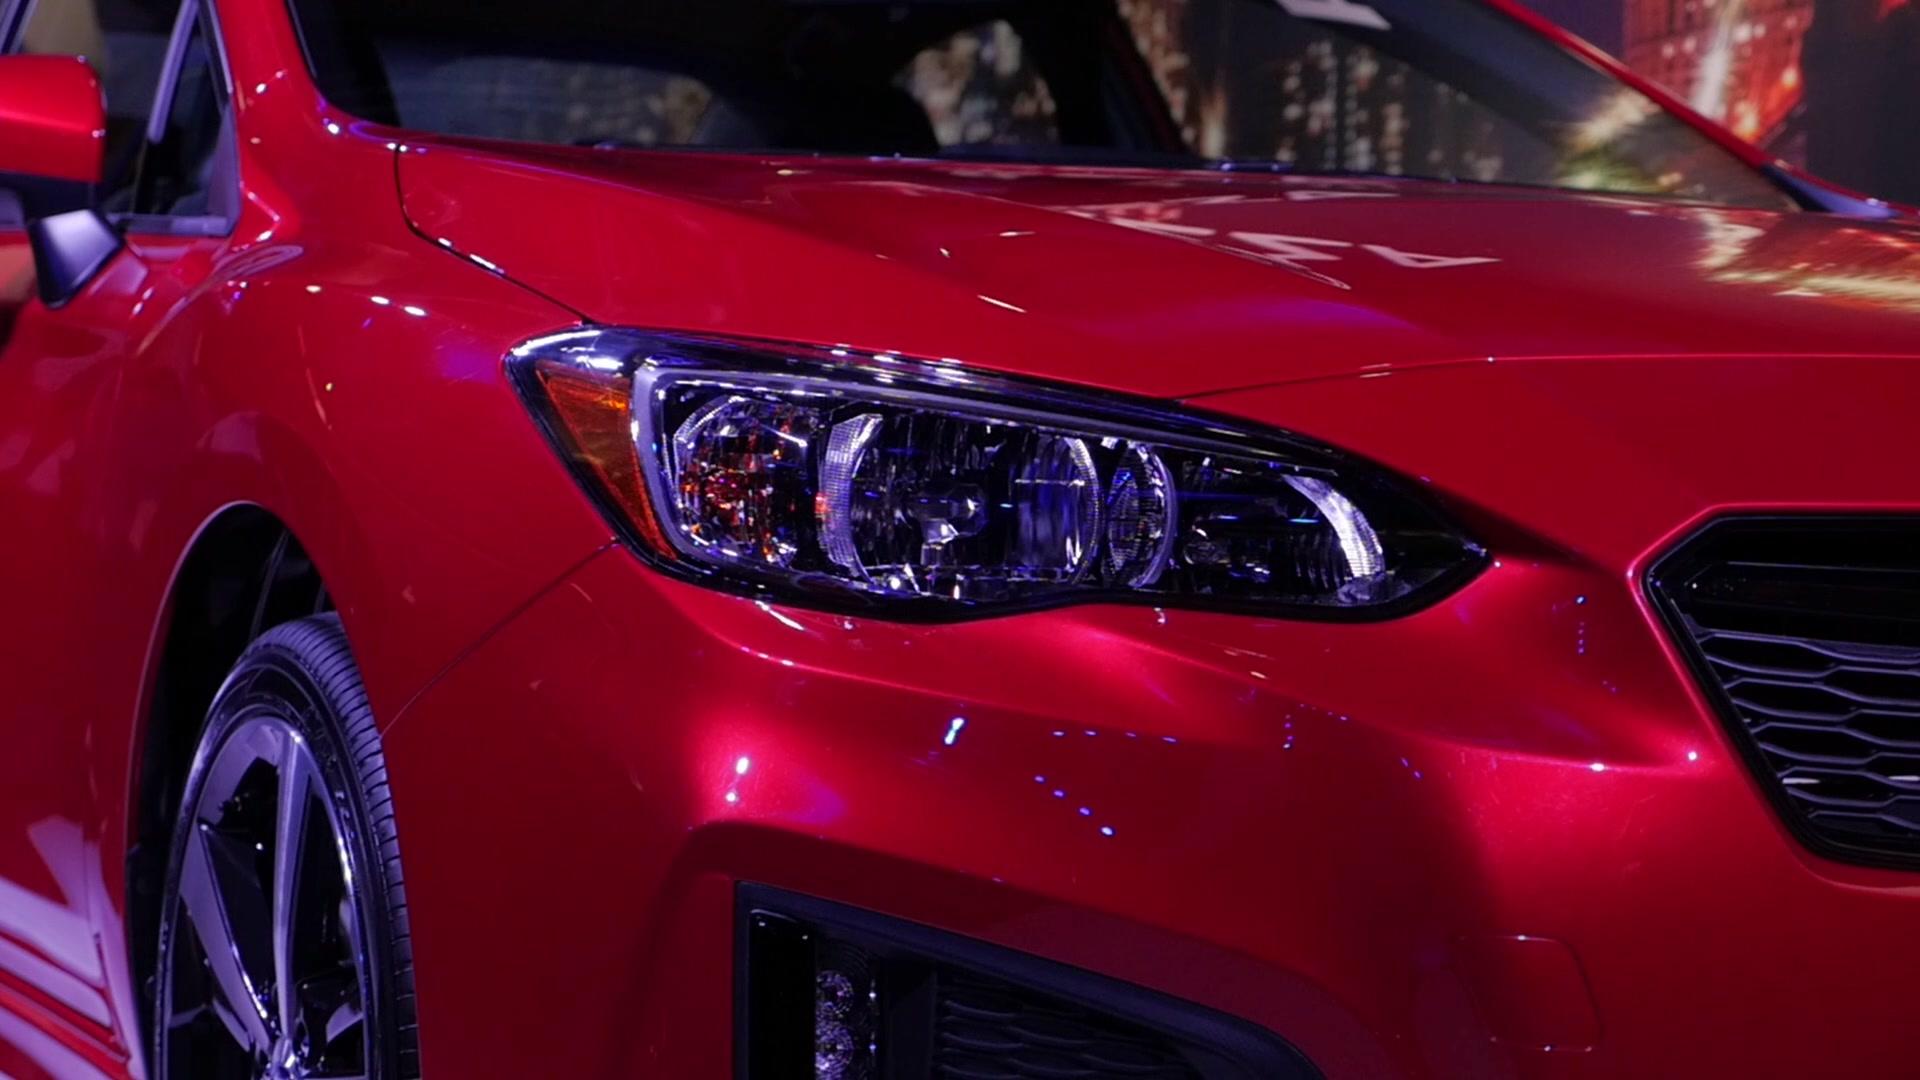 Subaru Secures Permit To Test Selfdriving Car In California Autoblog - Subaru car show california